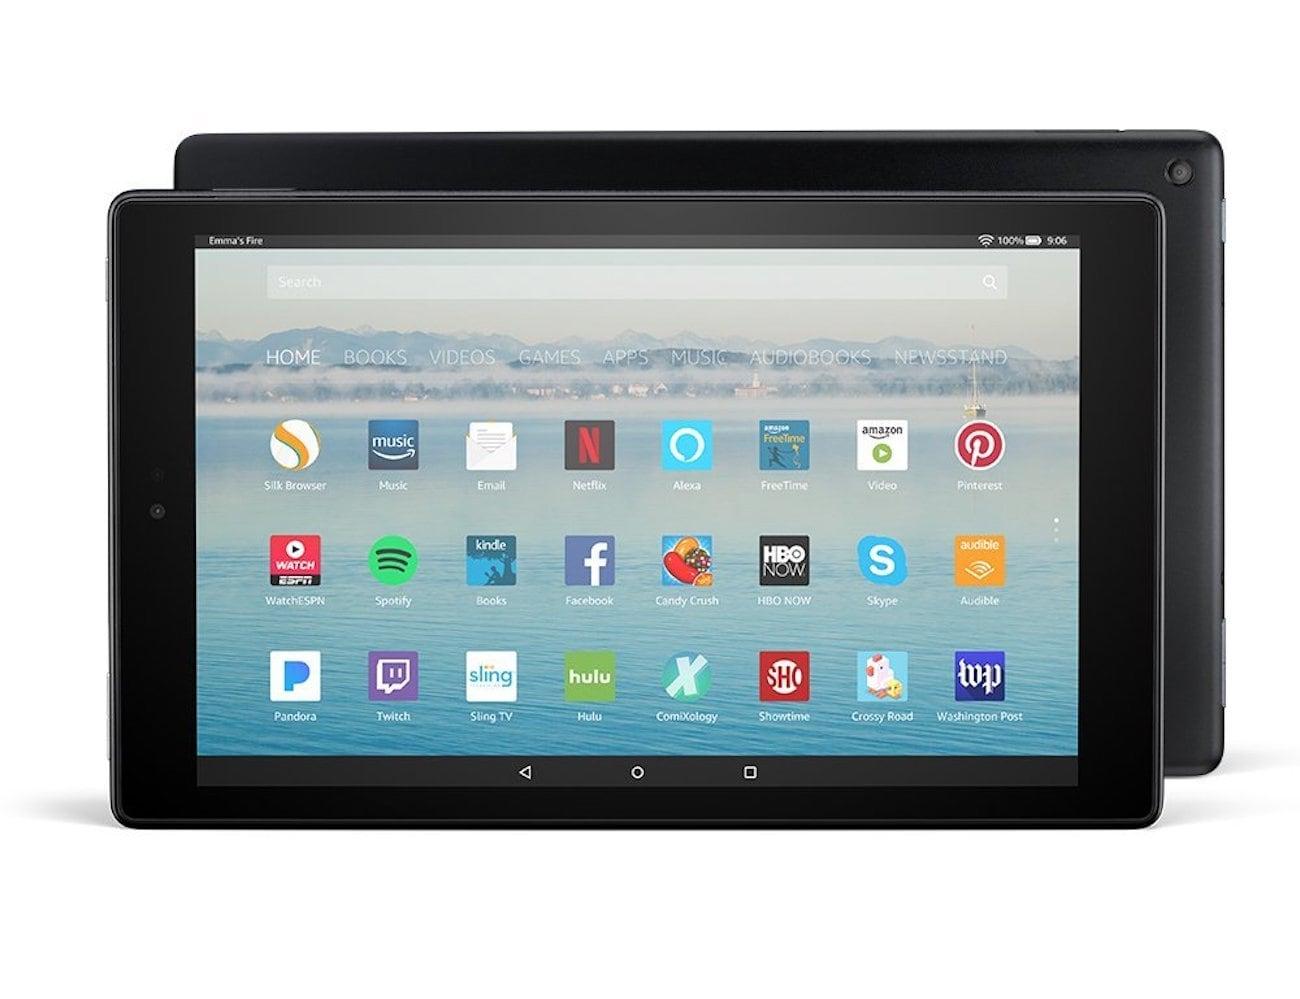 Amazon Fire HD 10 1080p Tablet